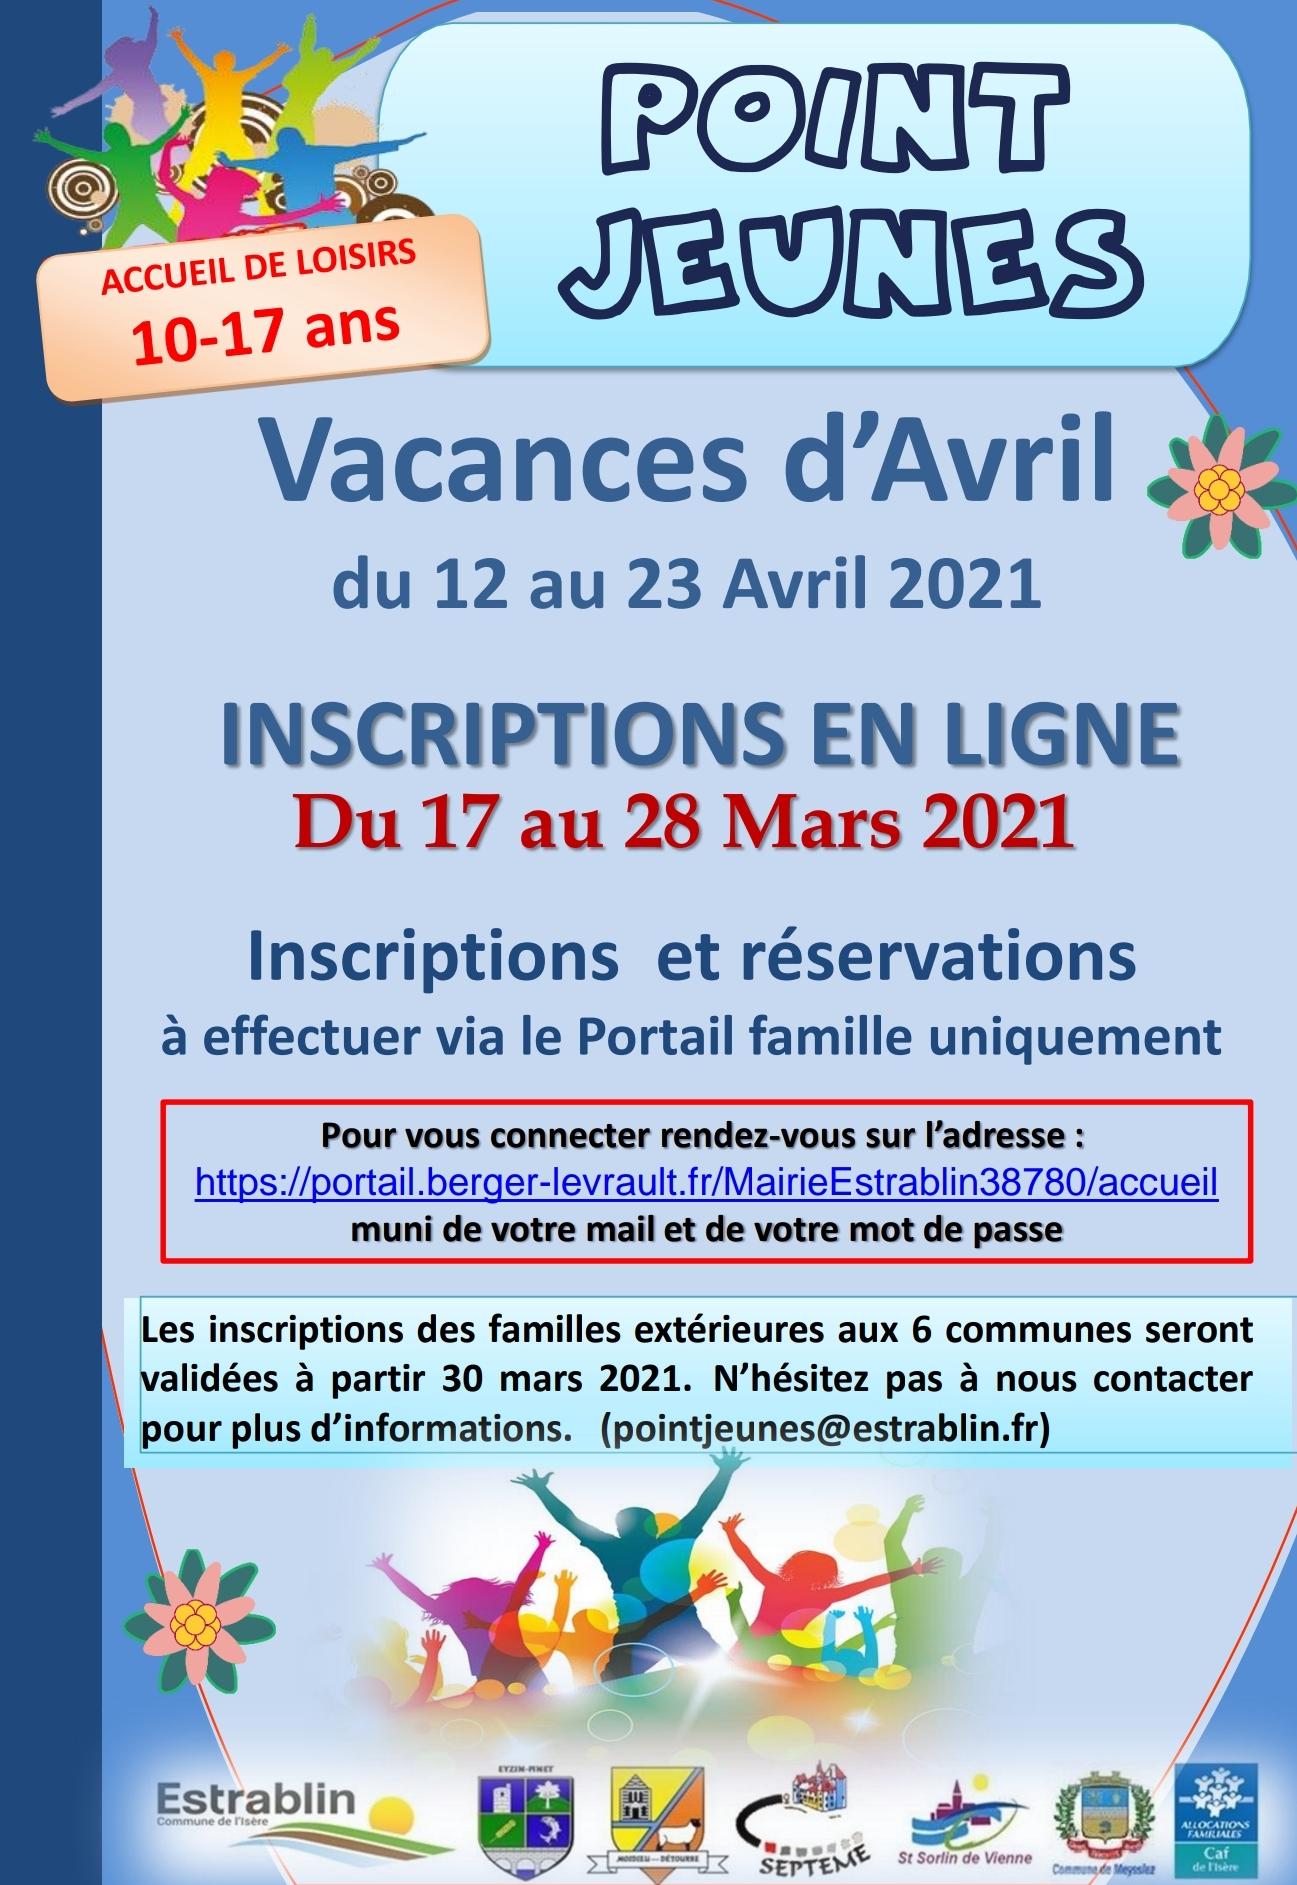 2021-03-11 Informations réservations en ligne Vacances Avril.jpg